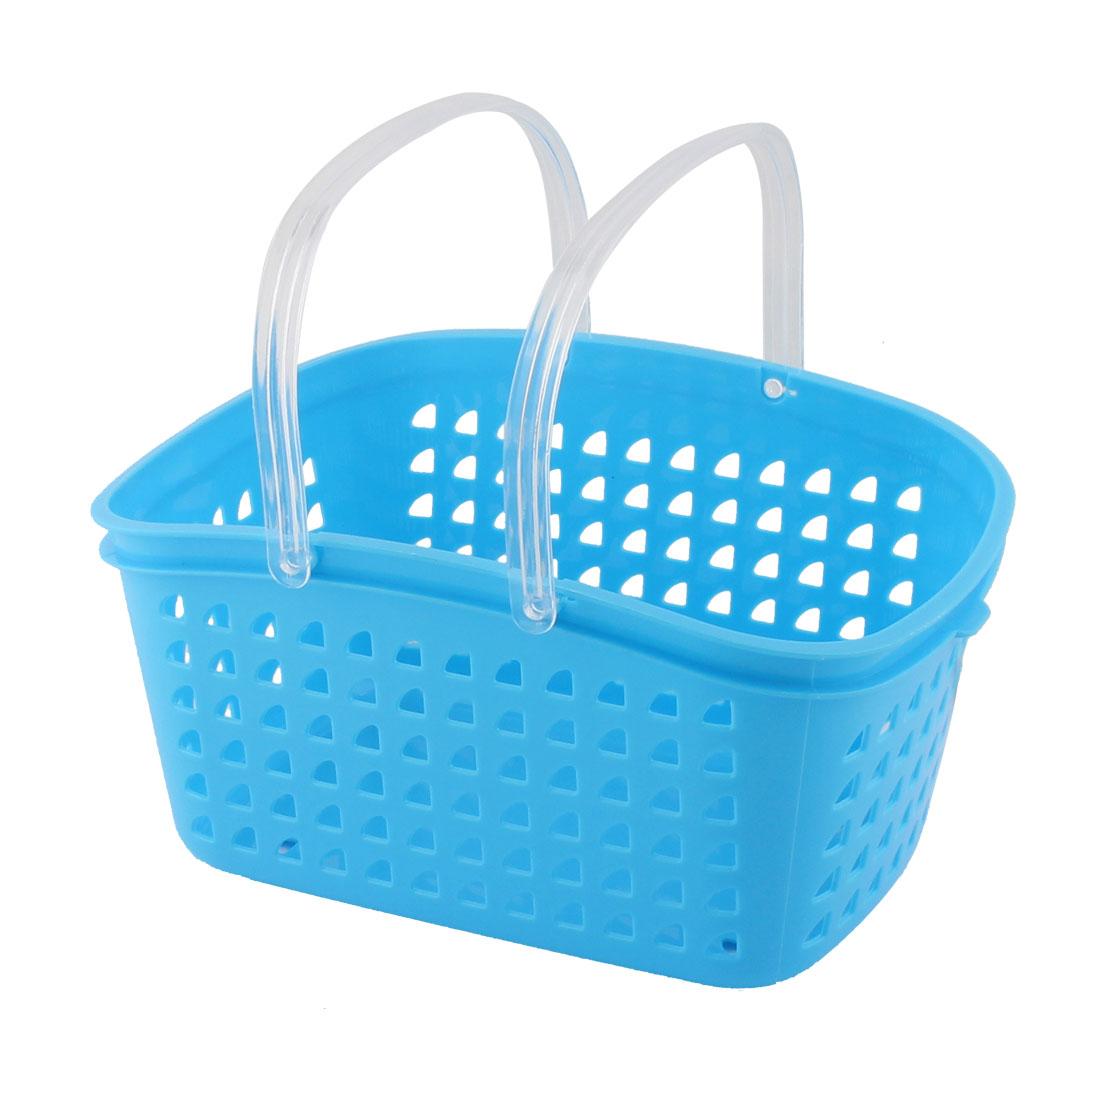 uxcell household bathroom plastic portable shower gel soap storage organizer basket box blue